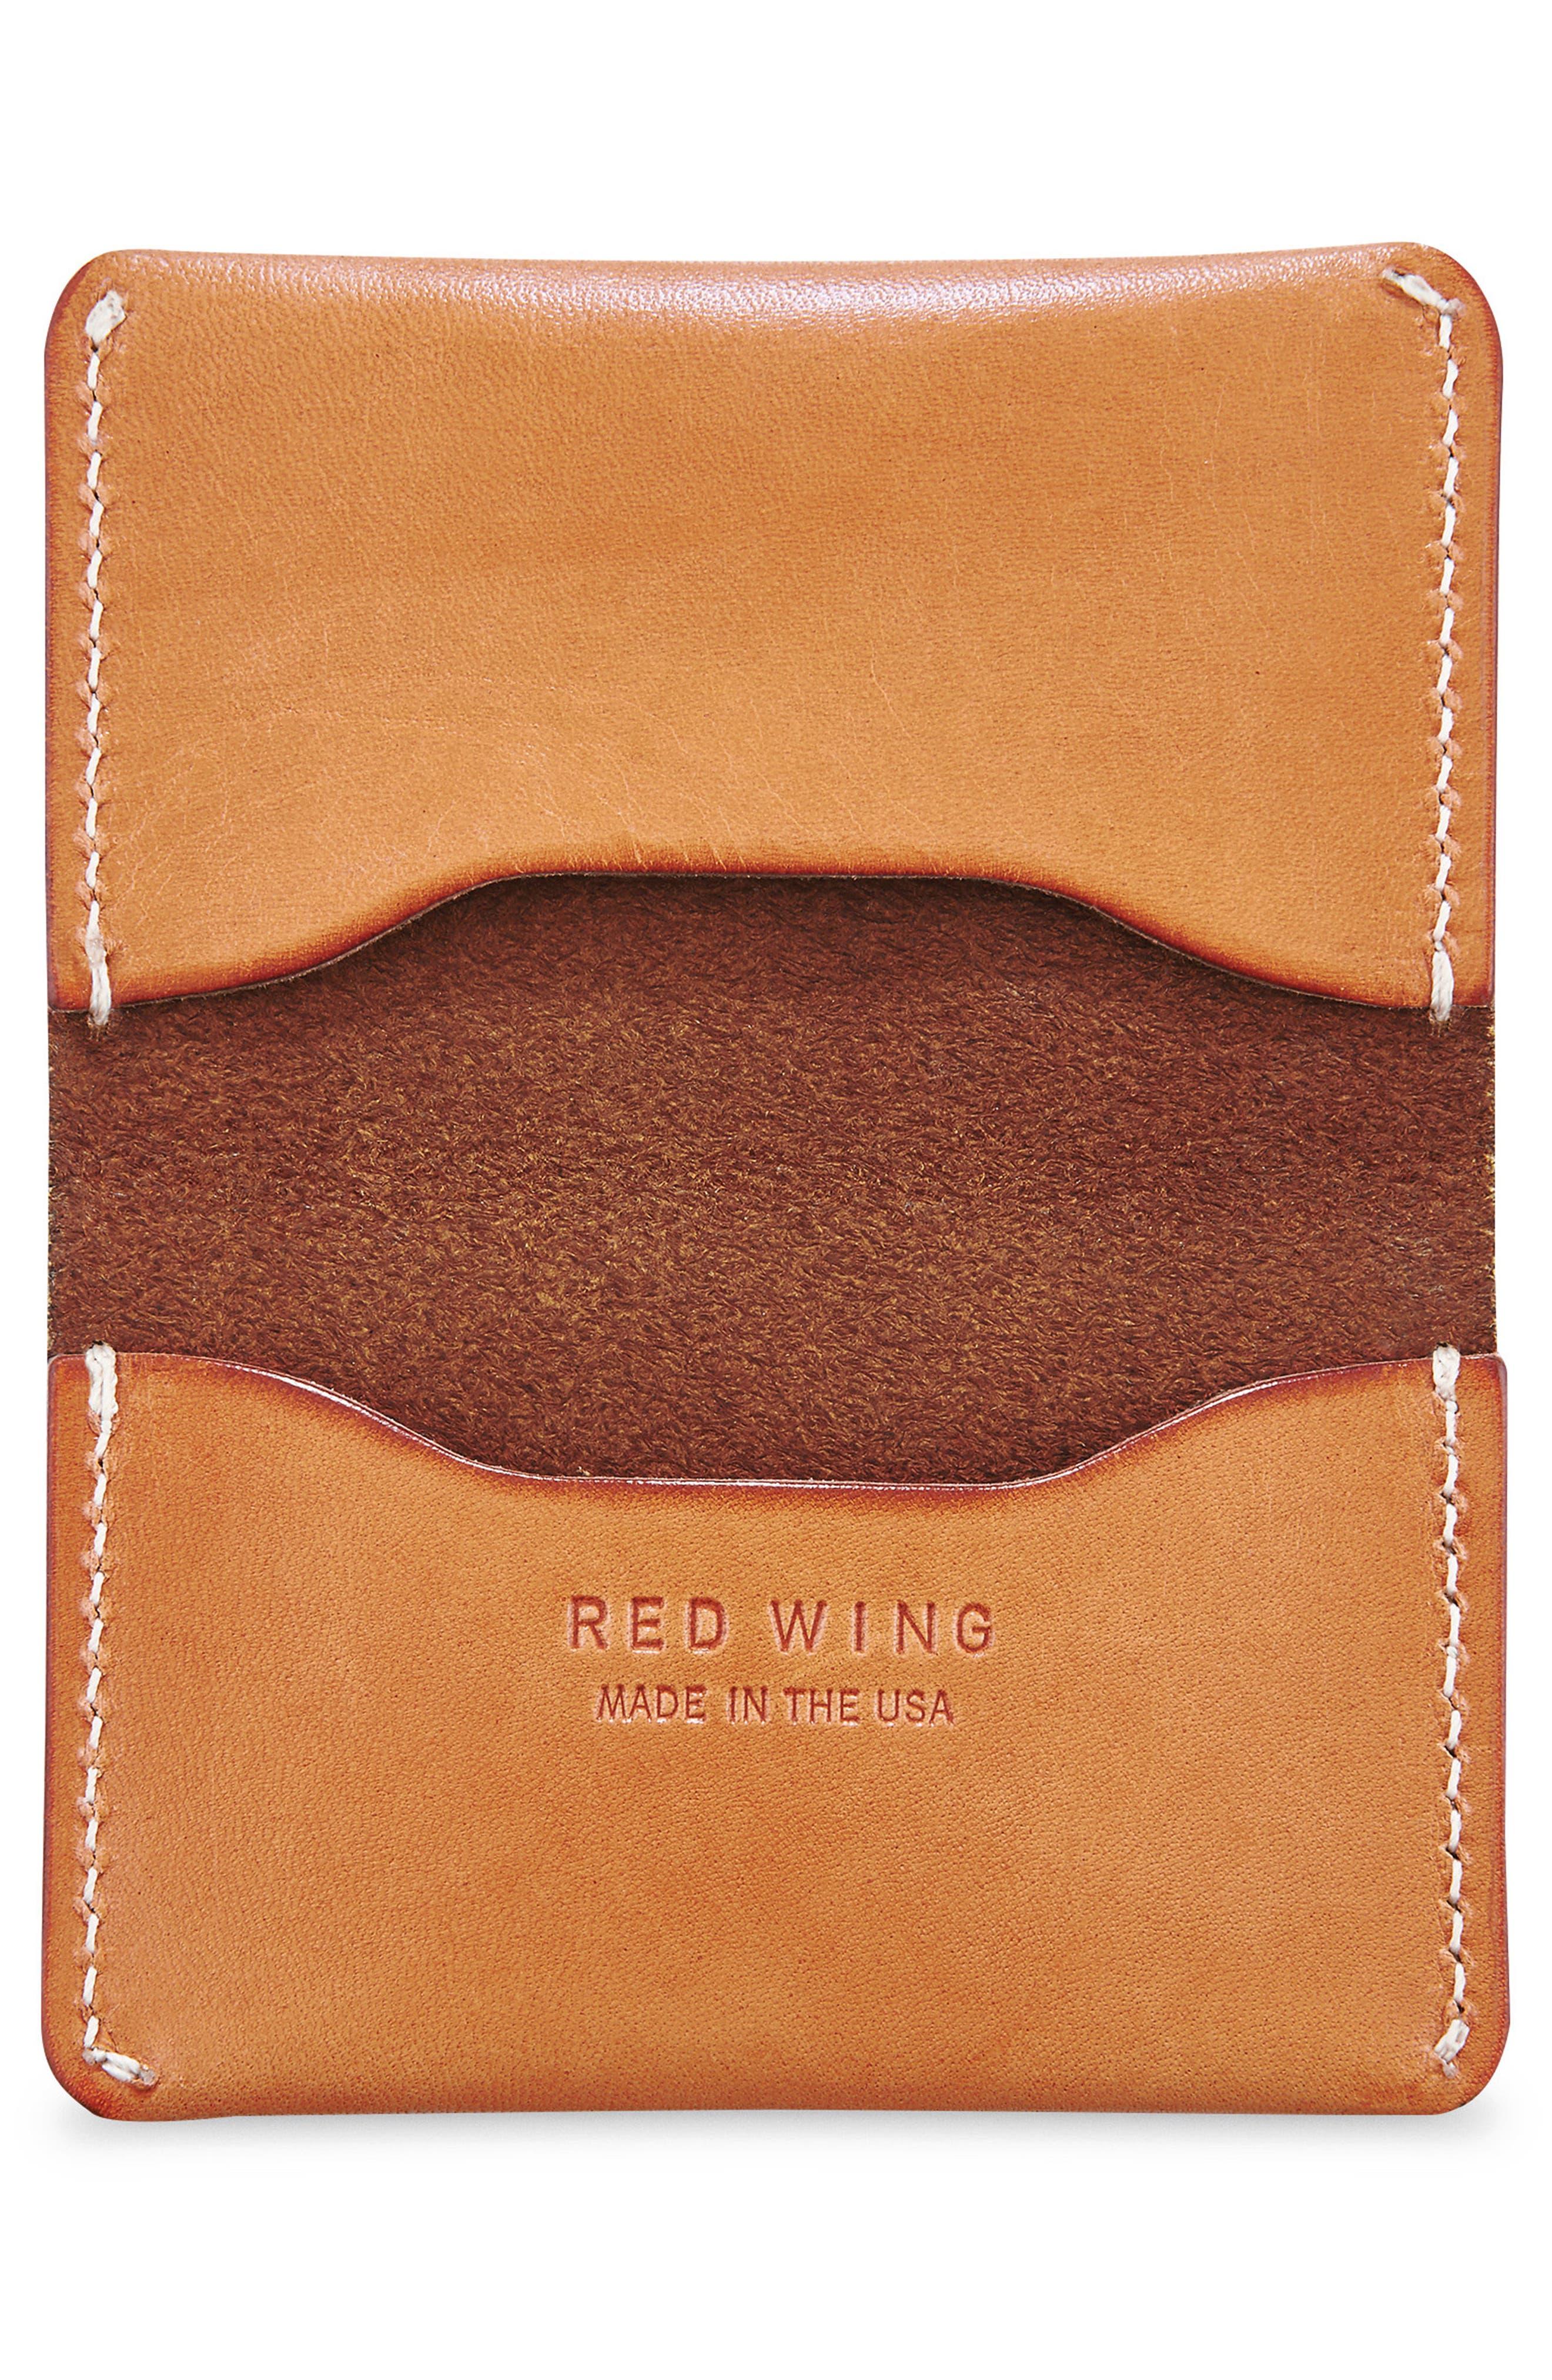 Leather Card Holder,                             Alternate thumbnail 2, color,                             TANNED VEGETABLE